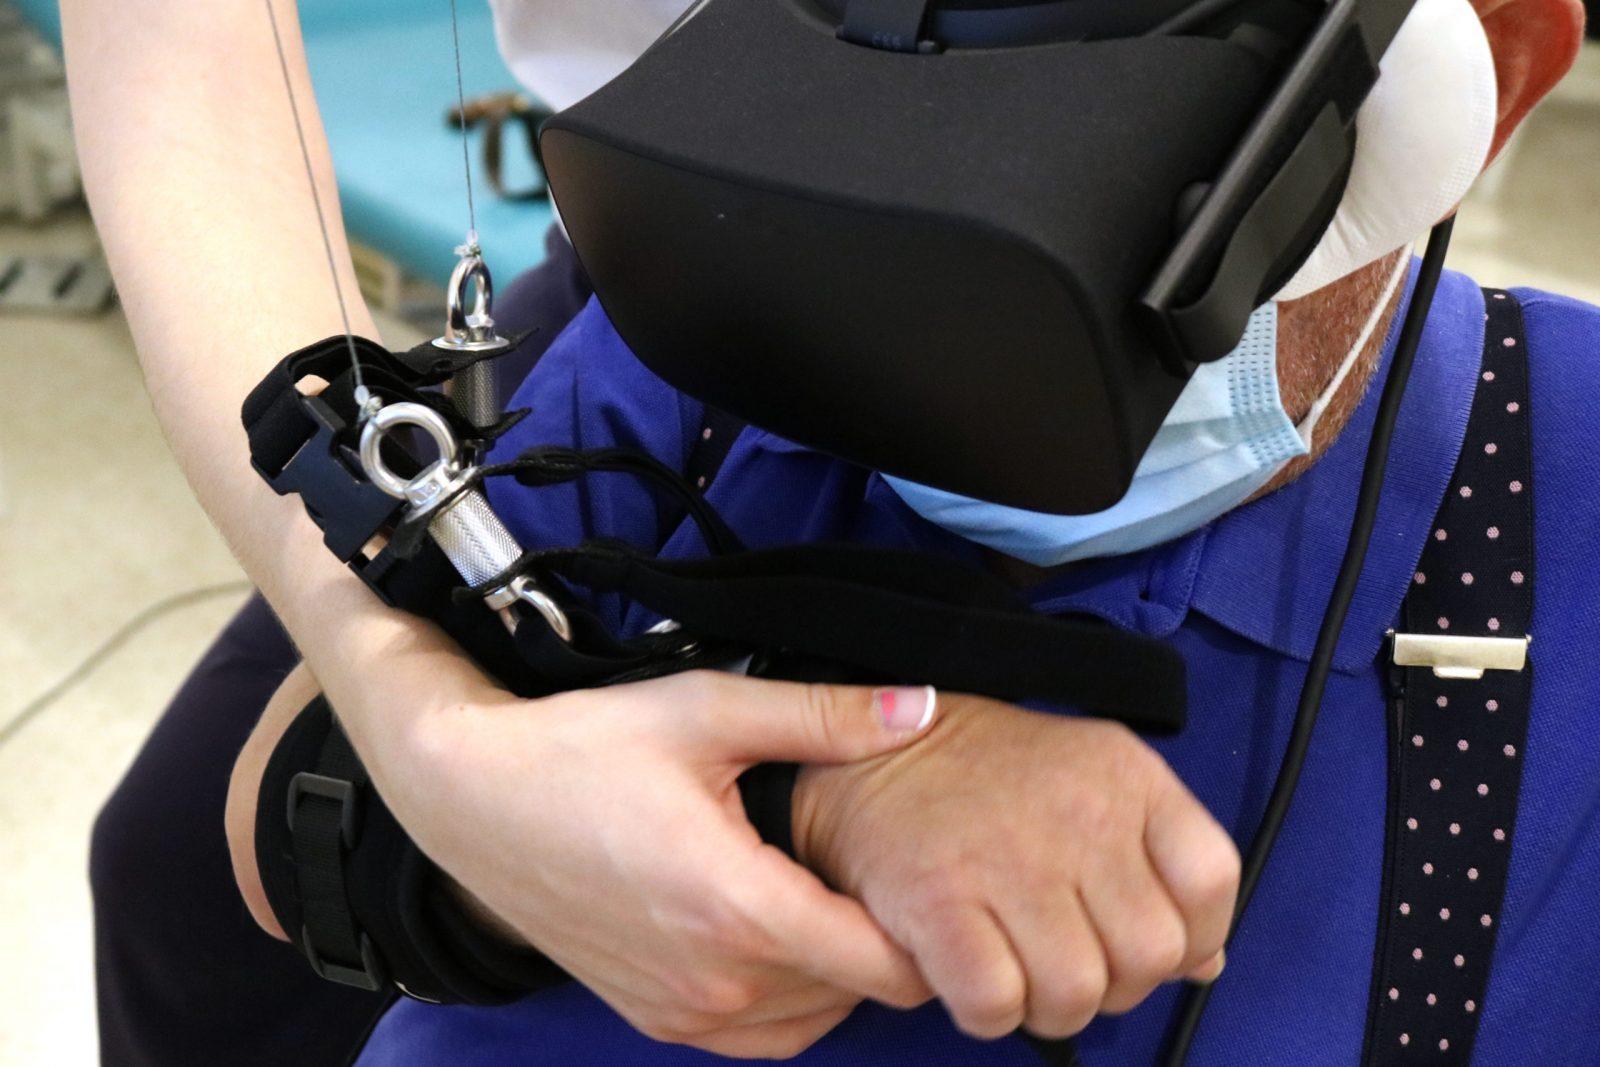 terapia intensiva neural maquina